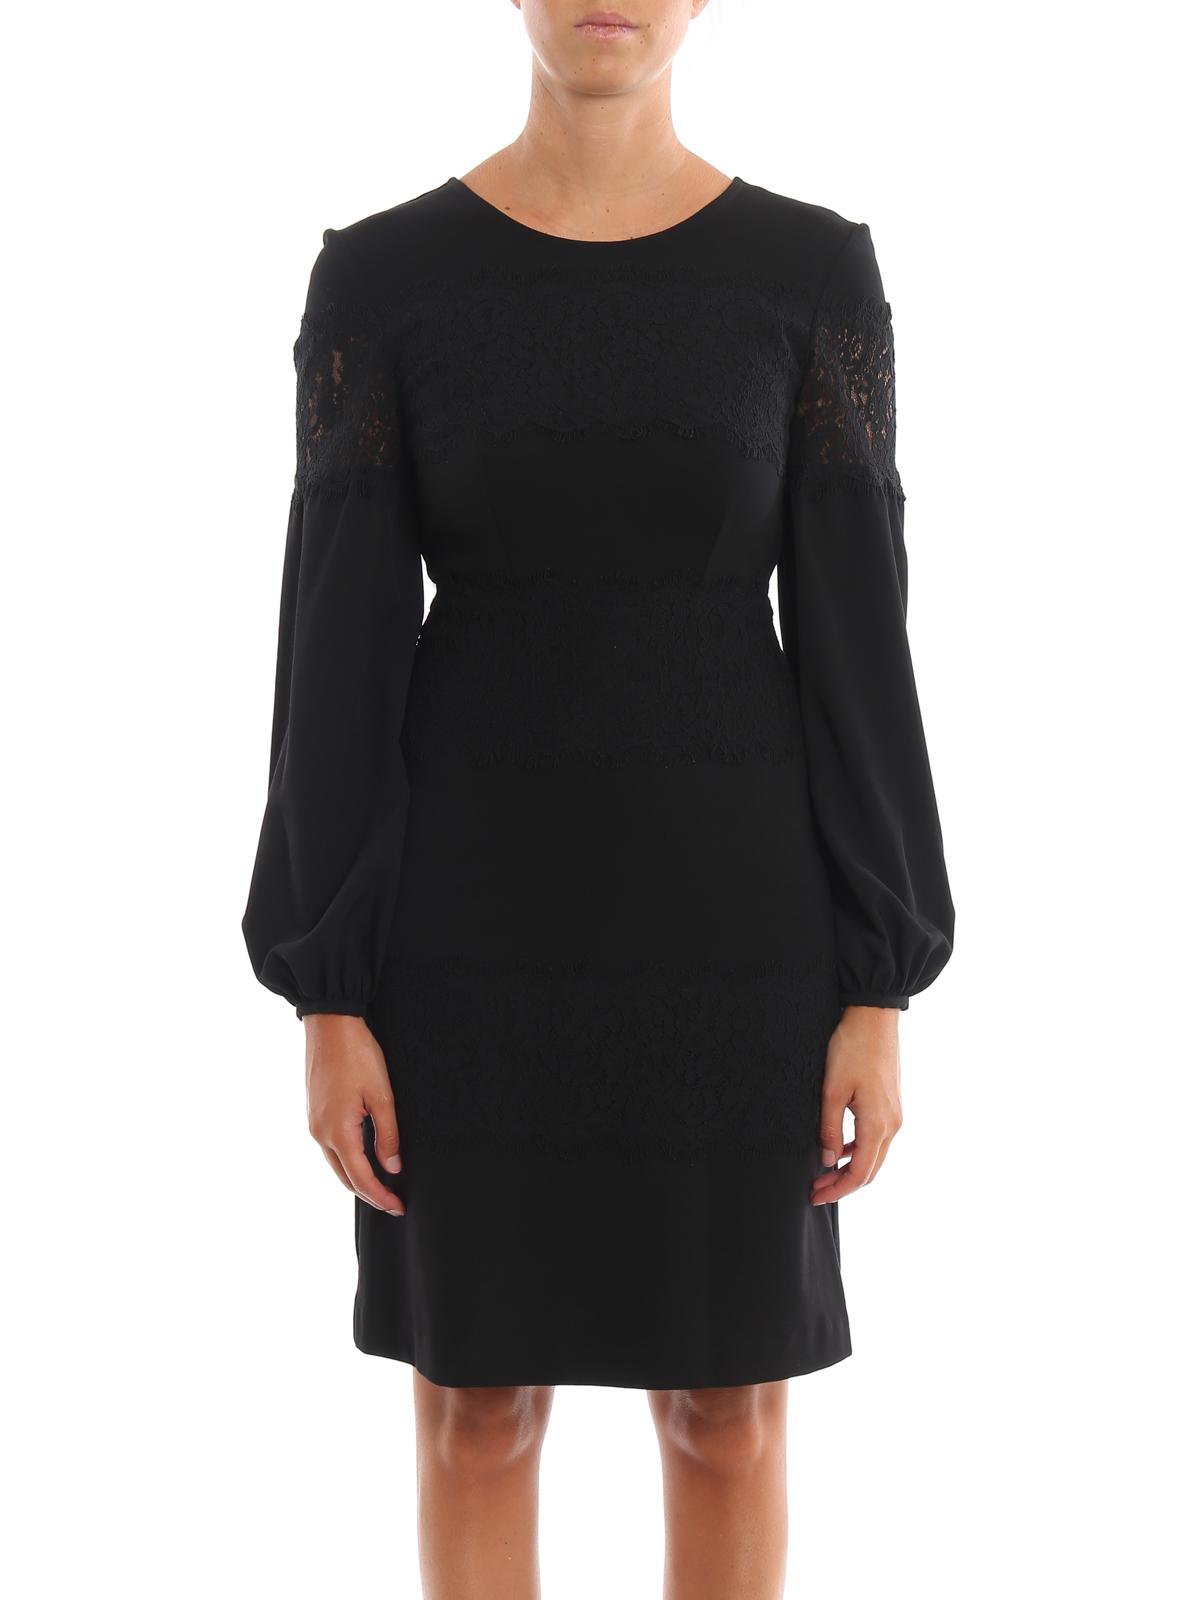 wholesale dealer a1208 6341d Twinset - Knielanges Kleid - Schwarz - Knielange Kleider ...